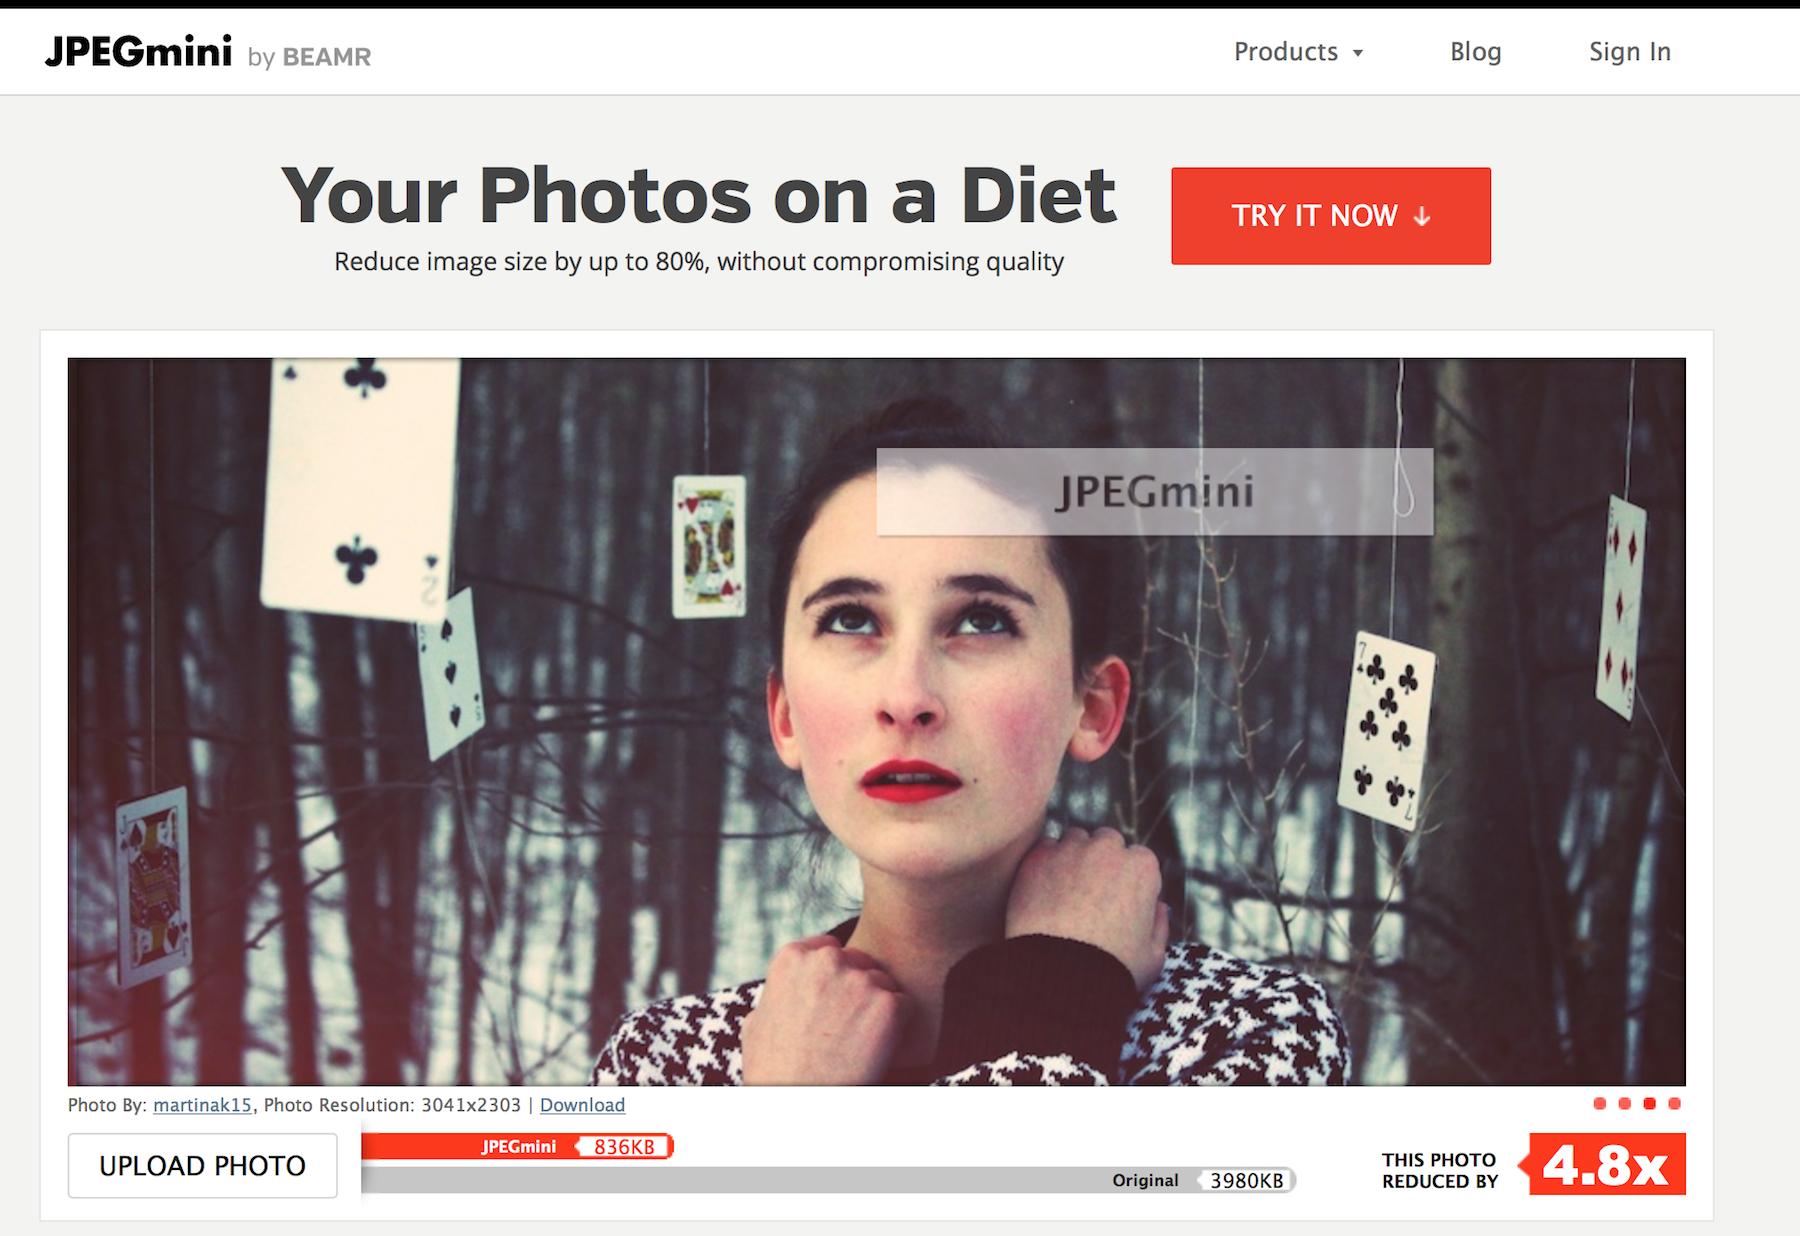 herramientas para reducir imágenes: JPGmini